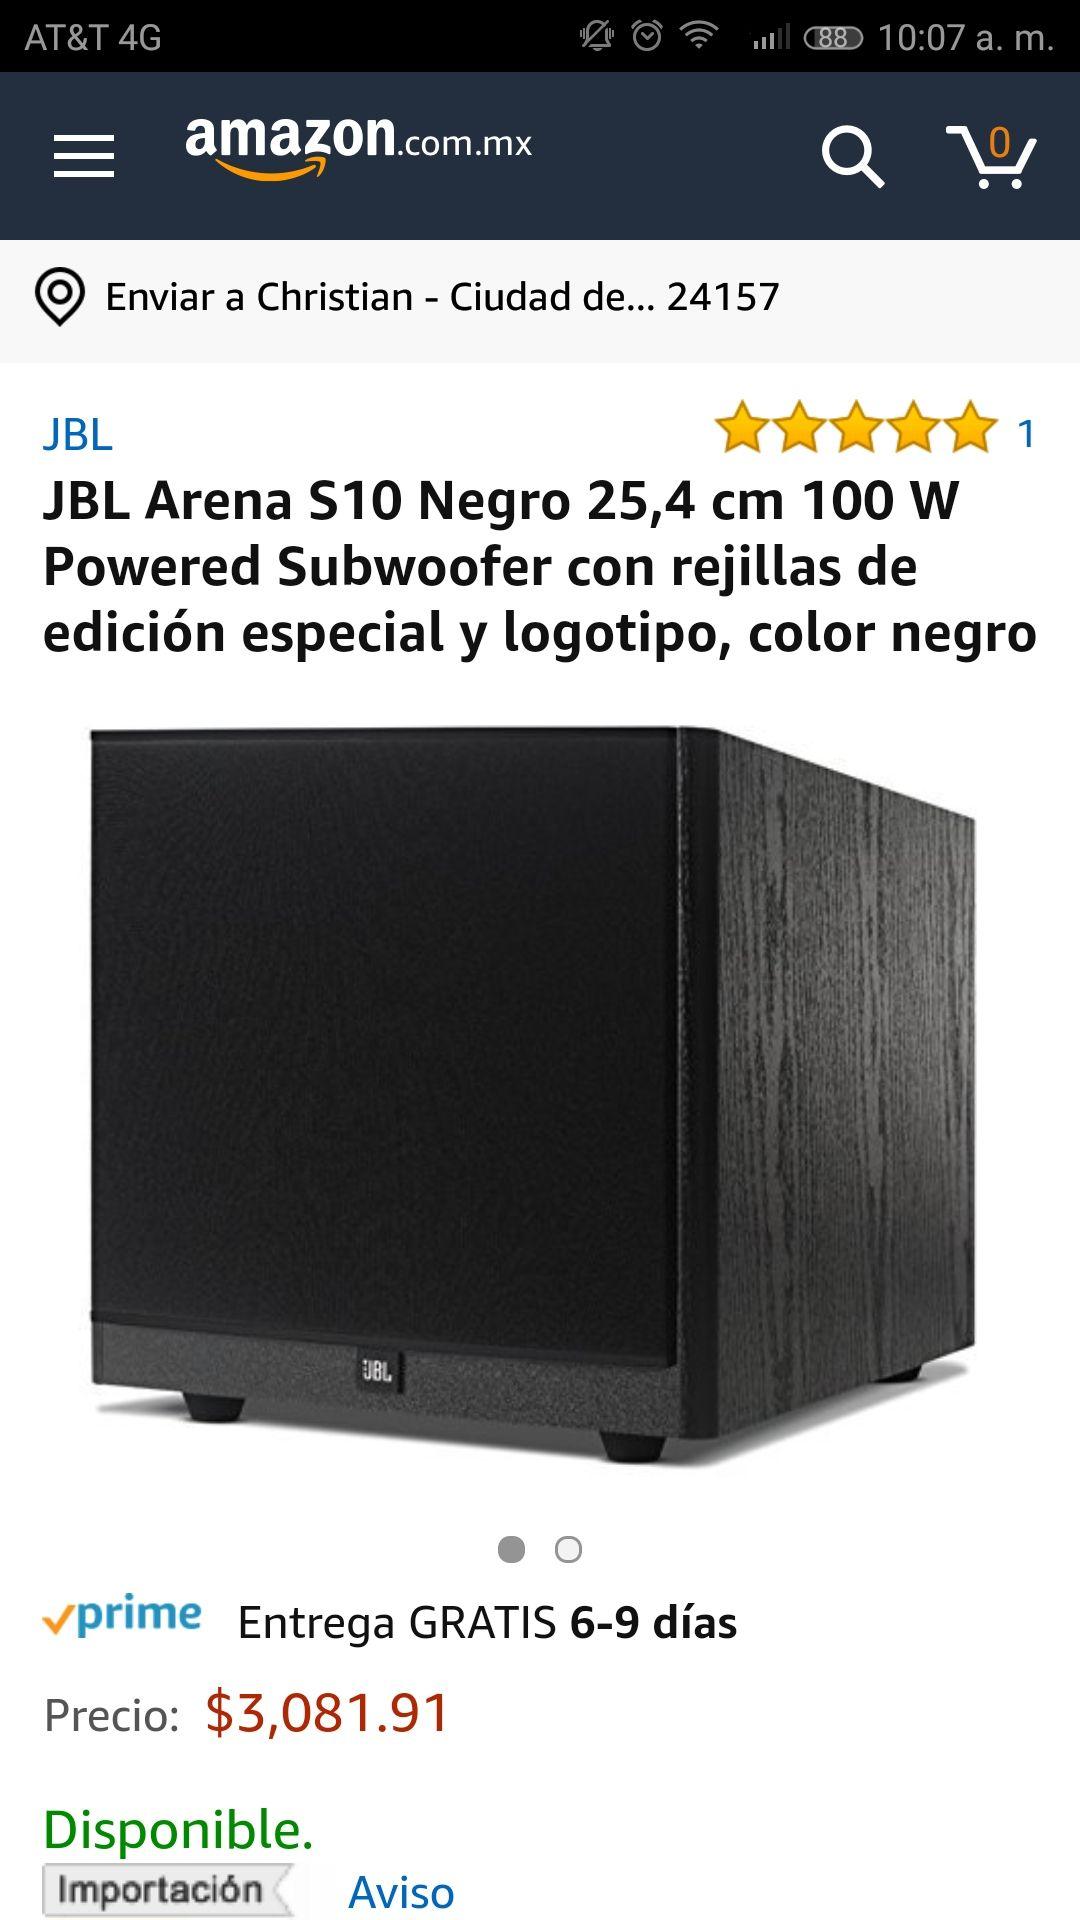 Amazon MX : JBL Arena S10Negro  100W Powered Subwoofer